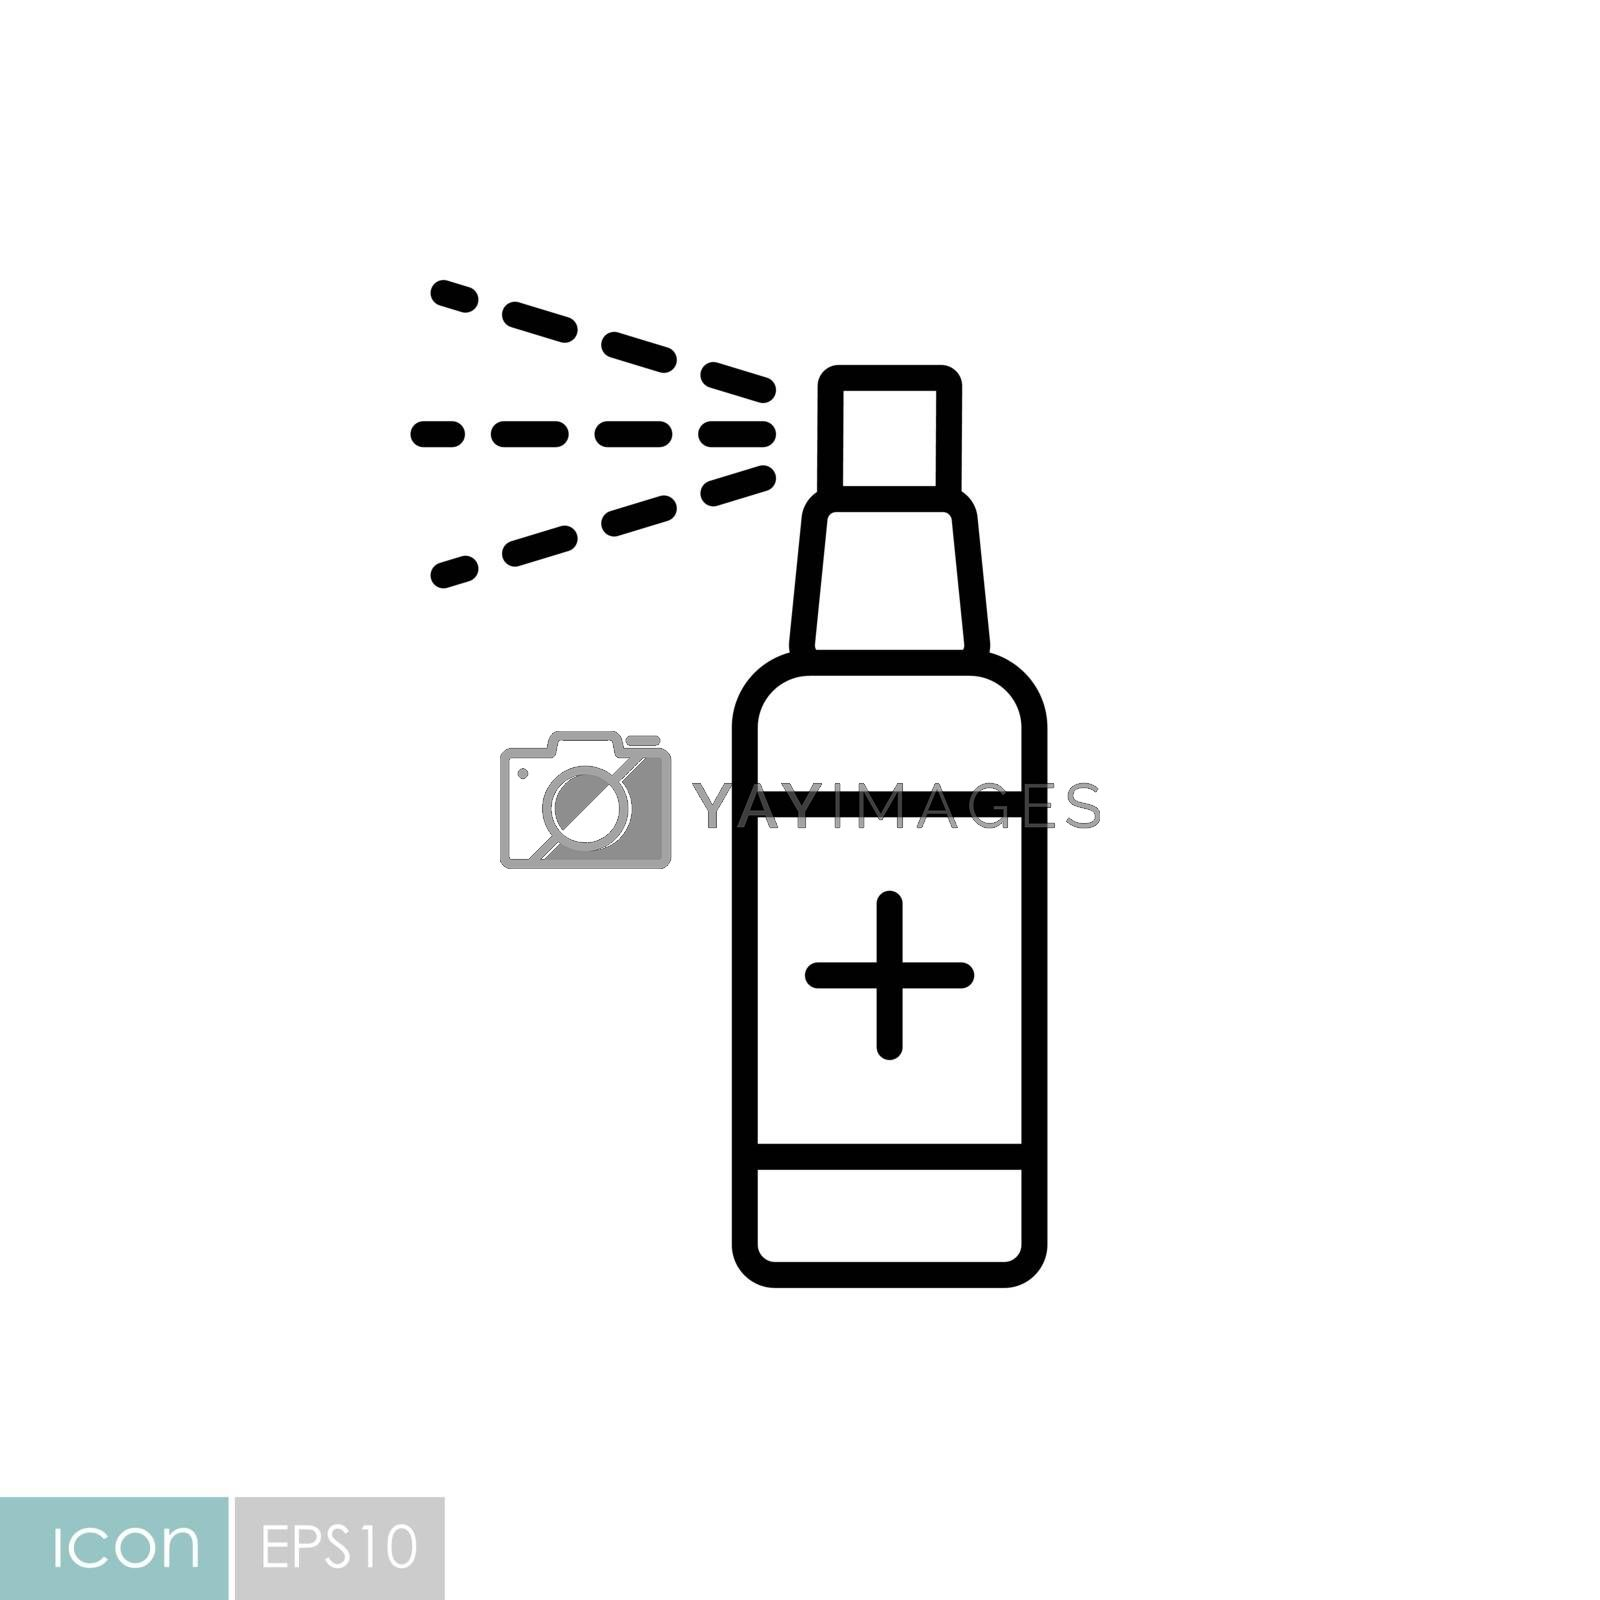 Anti-bacterial sanitizer spray, hand sanitizer vector icon. Coronavirus. Graph symbol for medical web site and apps design, logo, app, UI